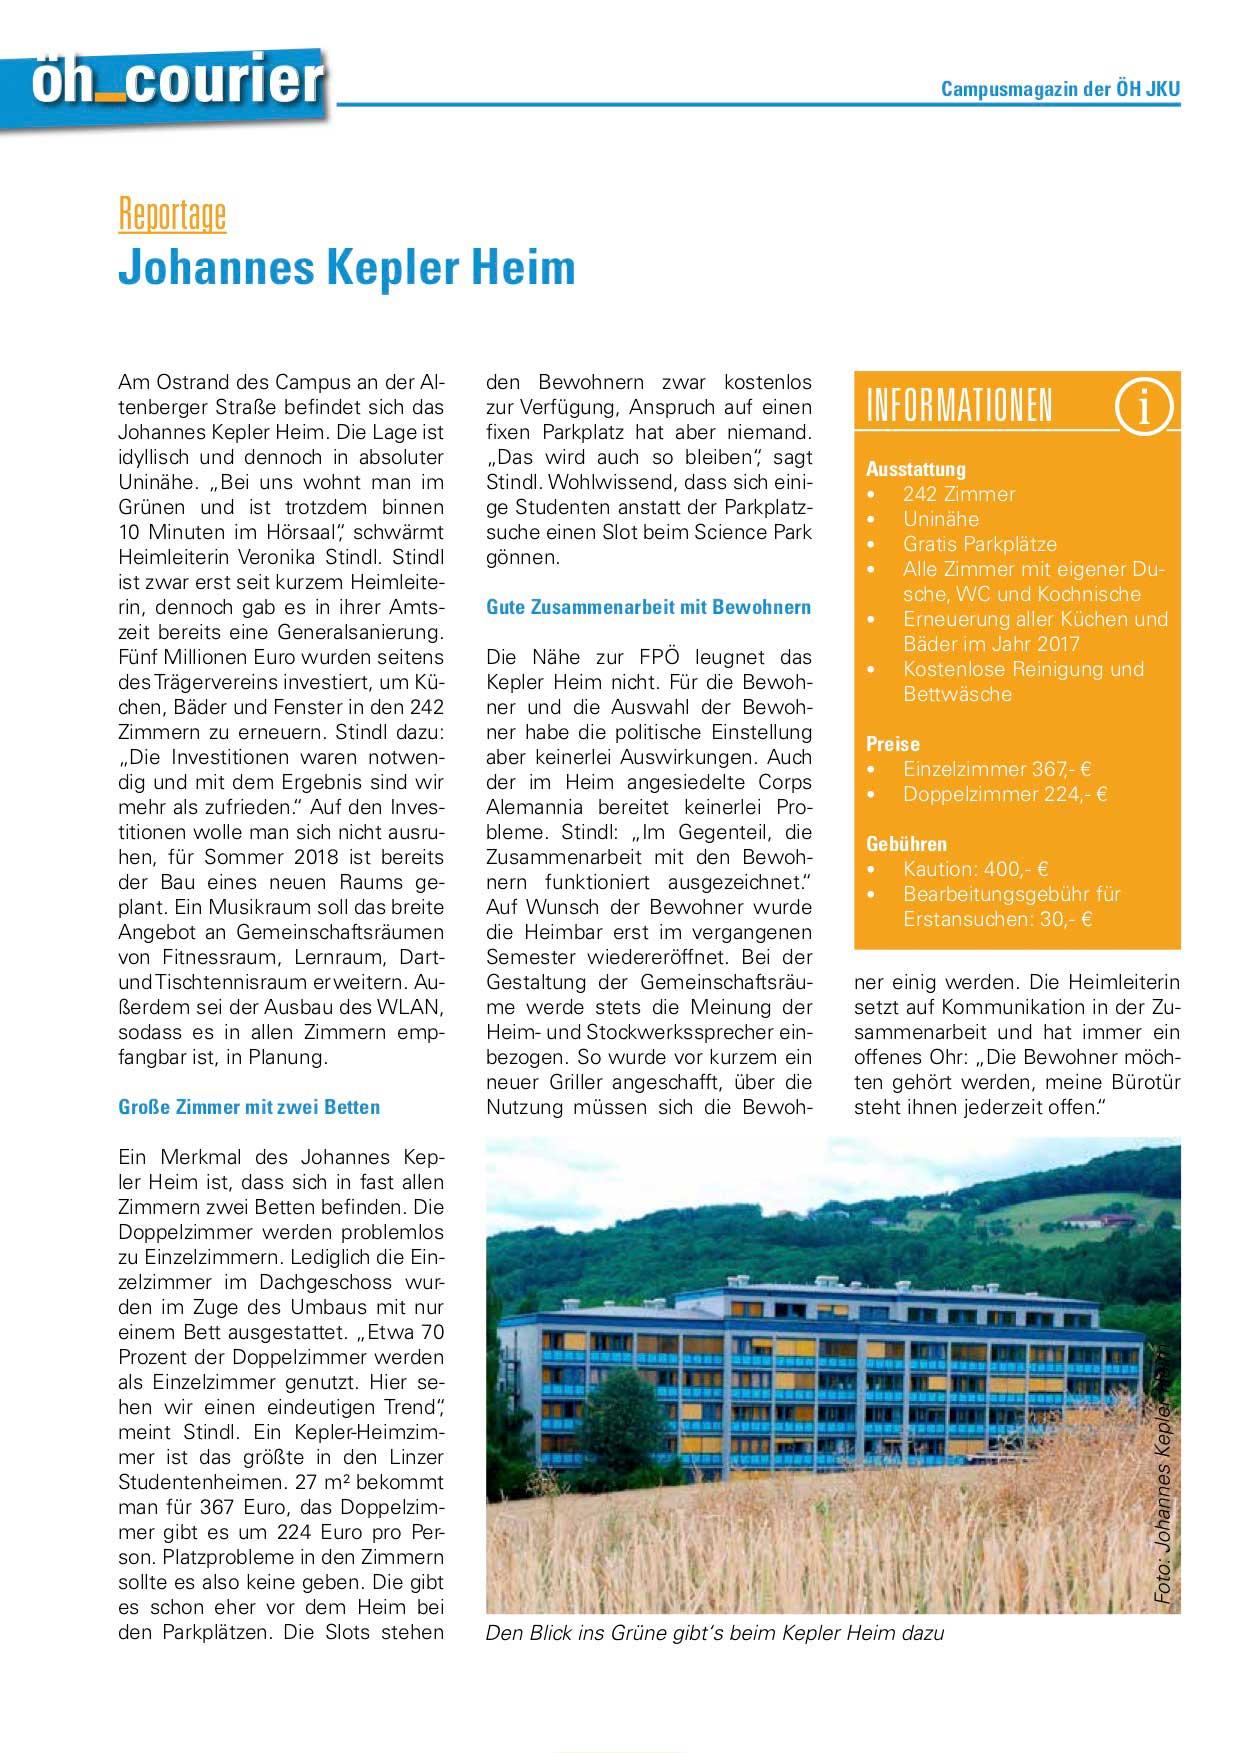 Presse JKU vom ÖH Courier